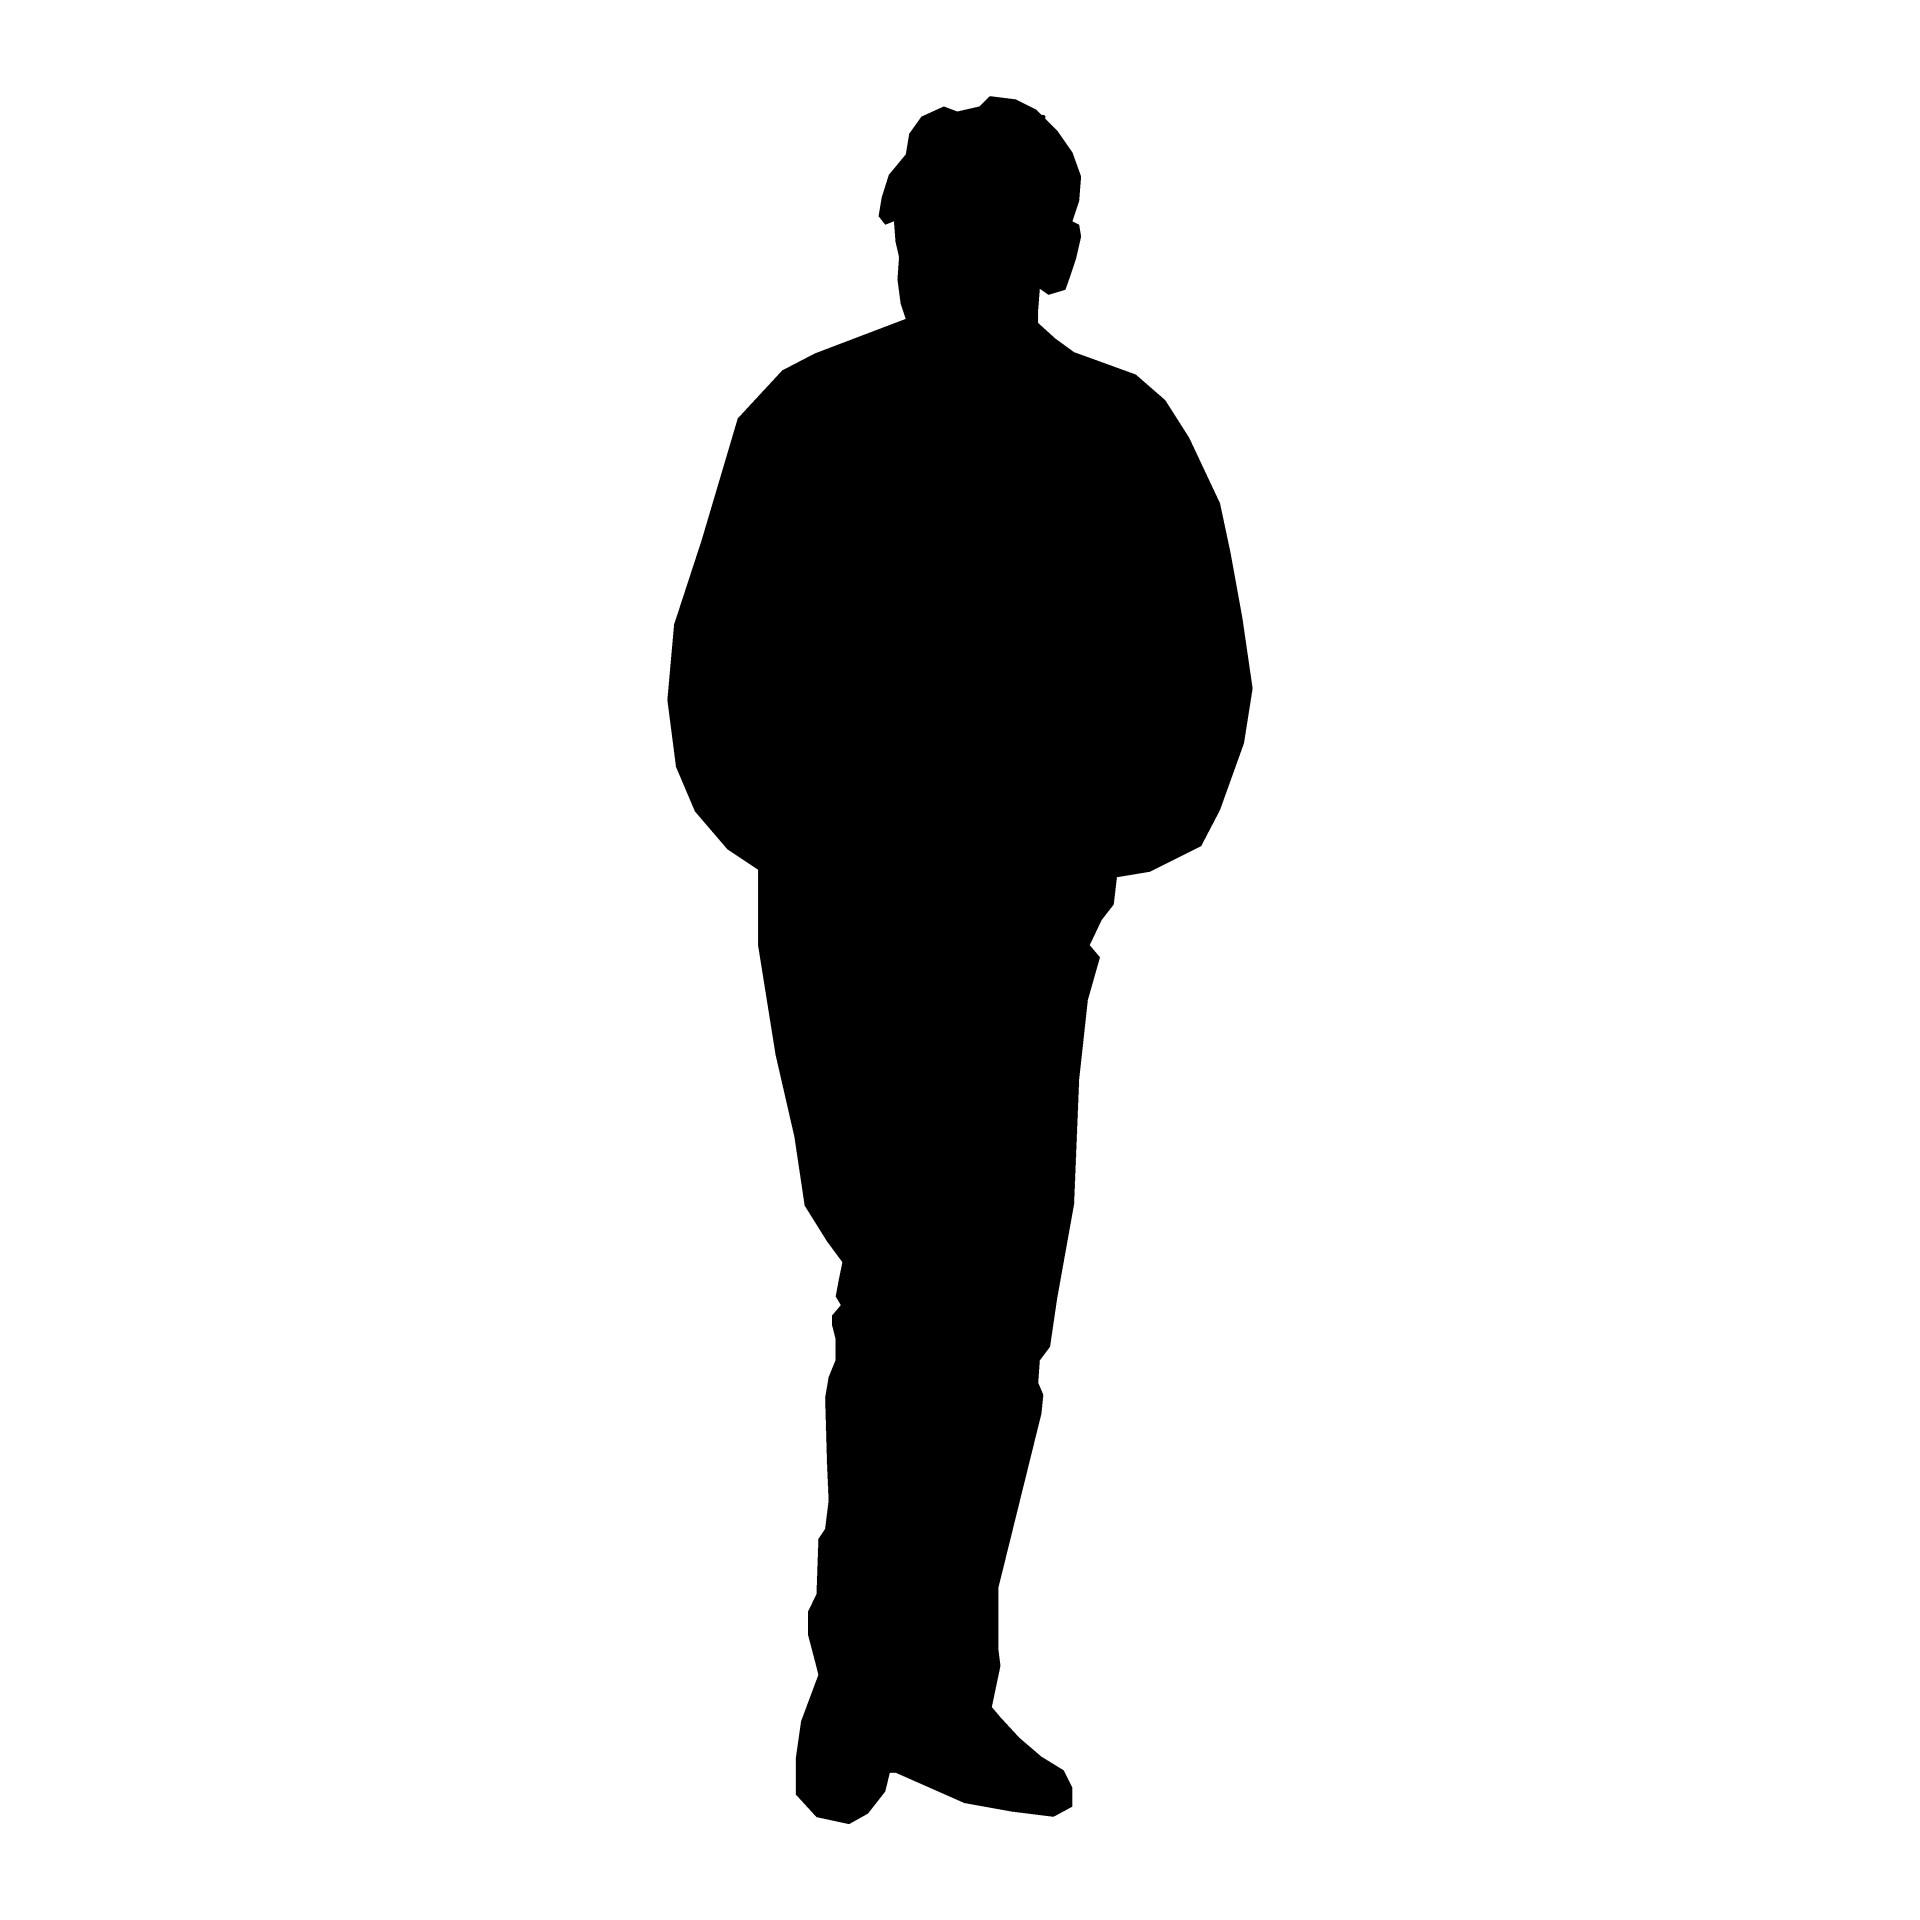 1920x1920 Silhouette Man Standing Free Stock Photo